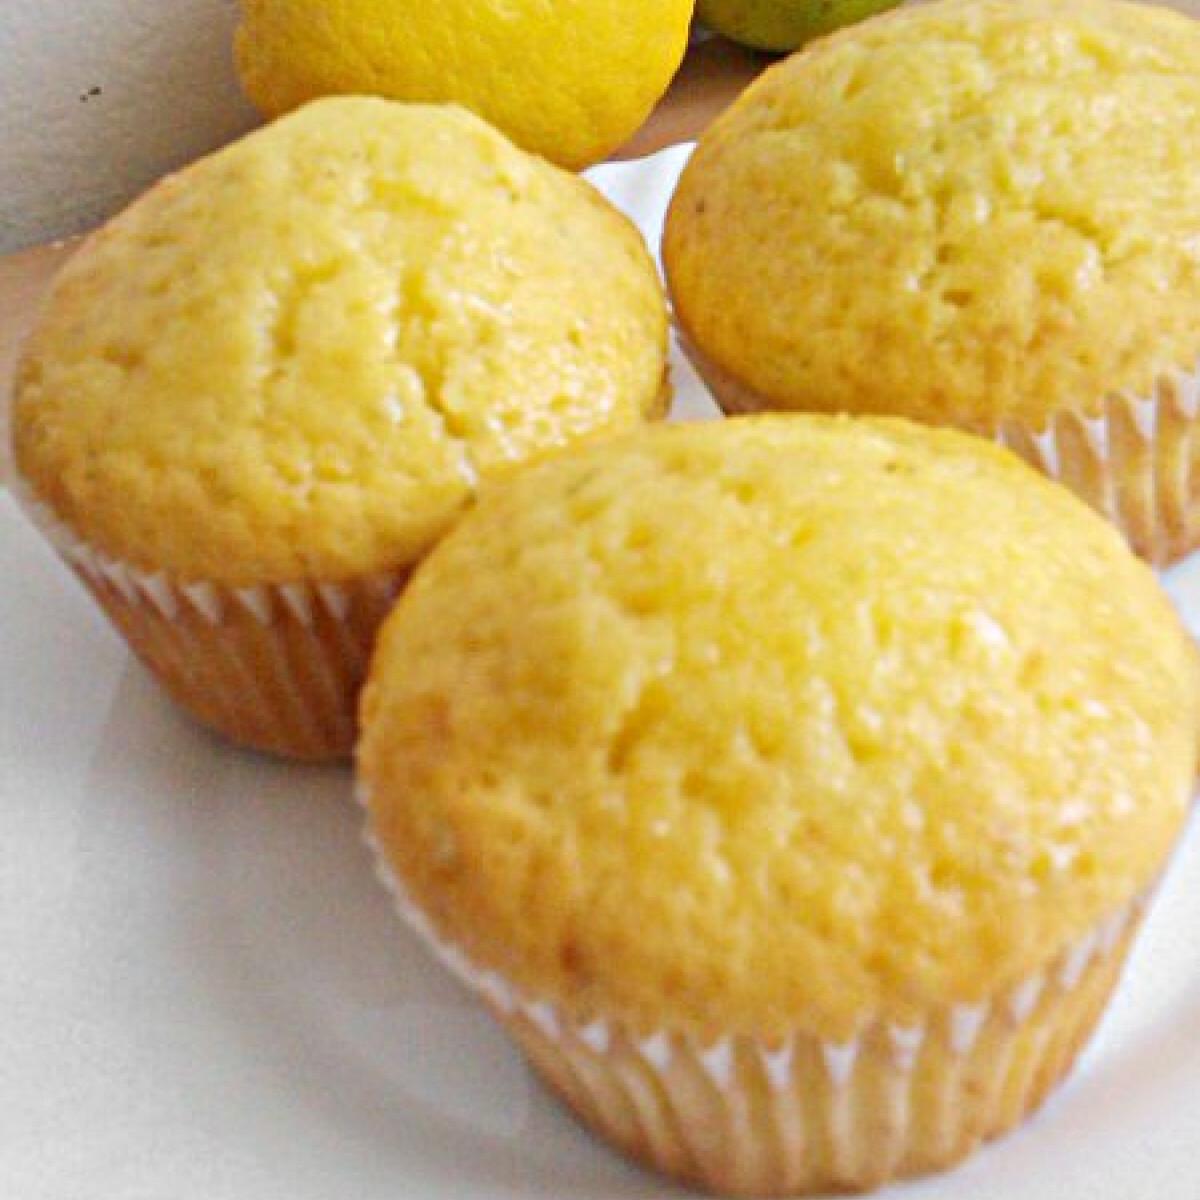 Lime szirupos muffin